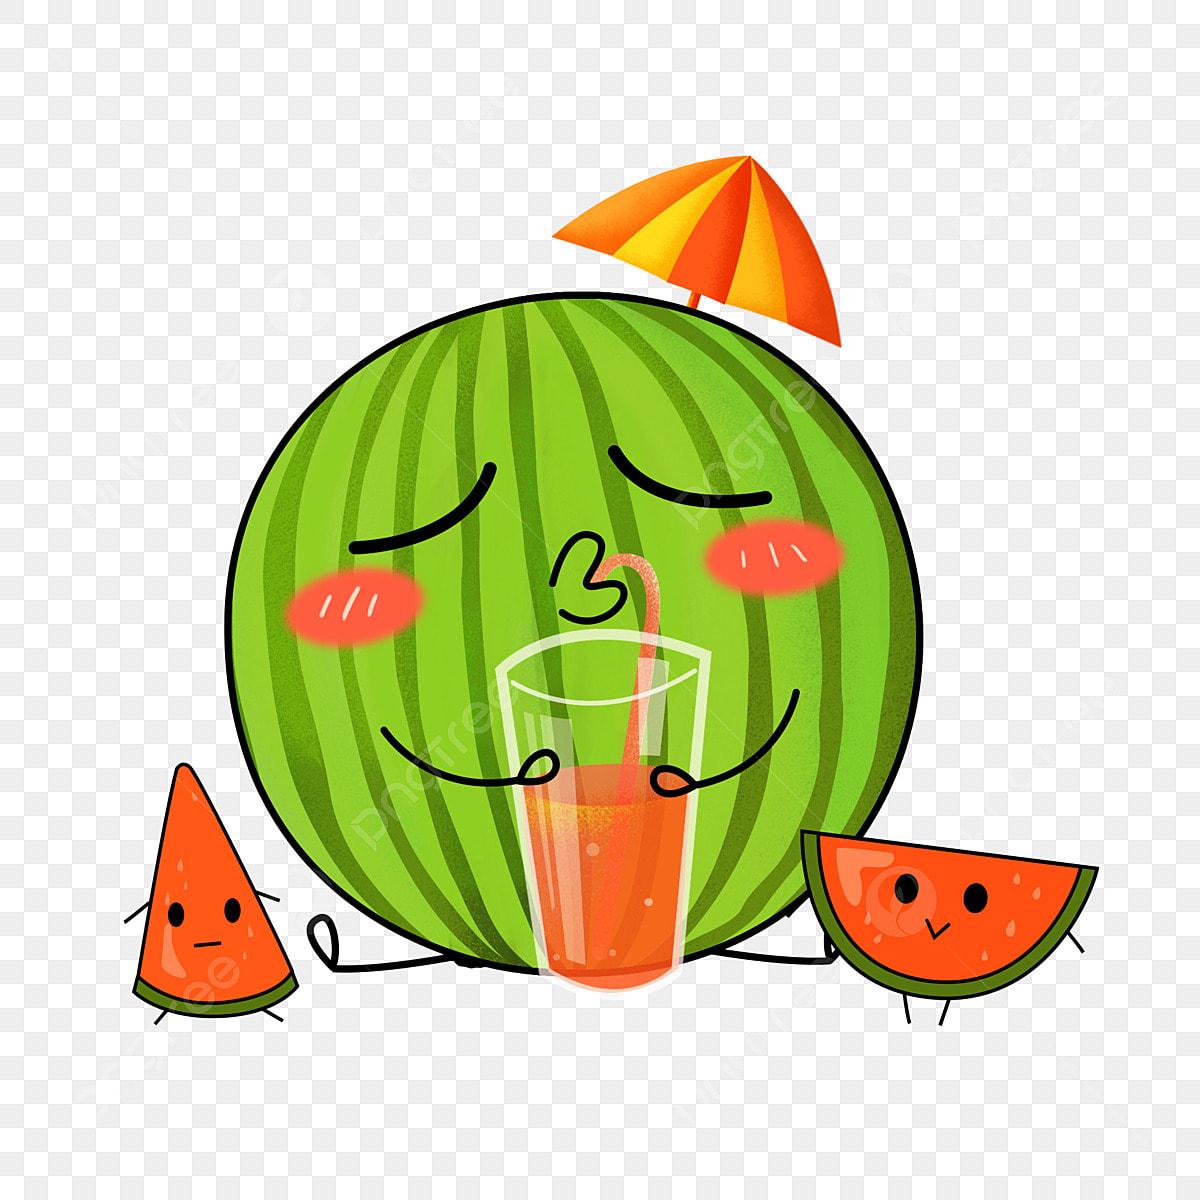 Watermelon Emoji Cartoon Cute Decorative Summer Element